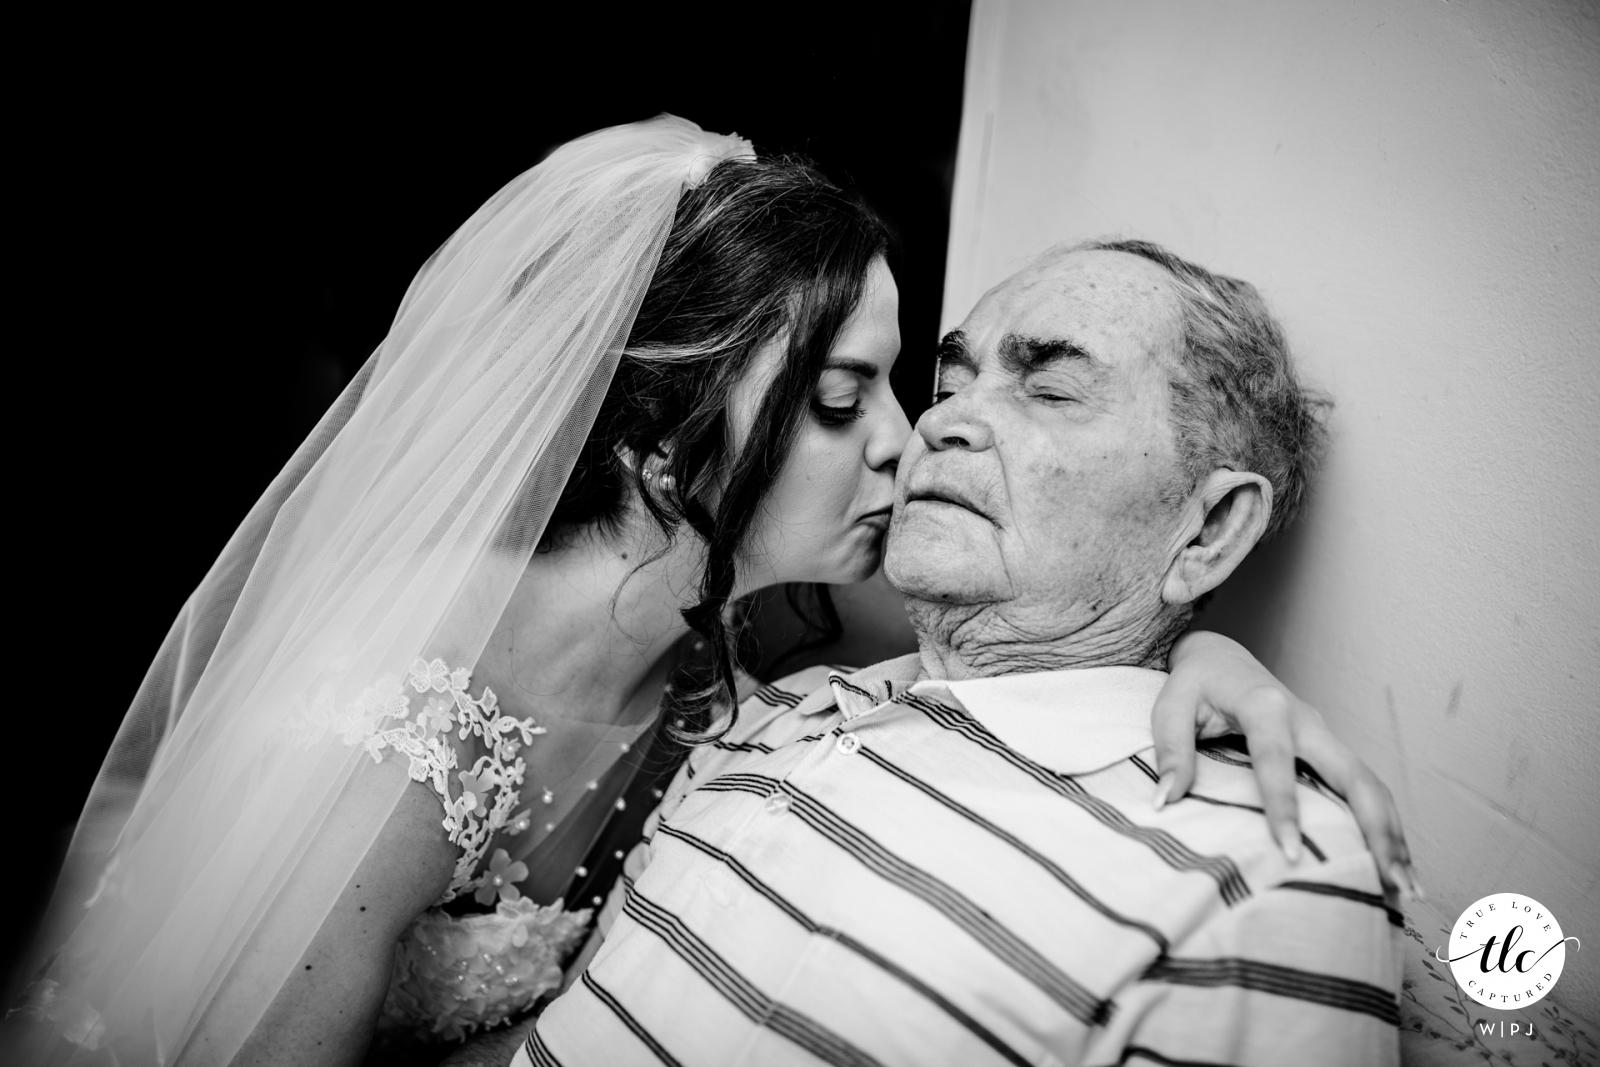 Italia foto de boda de una novia pachino y su abuelo